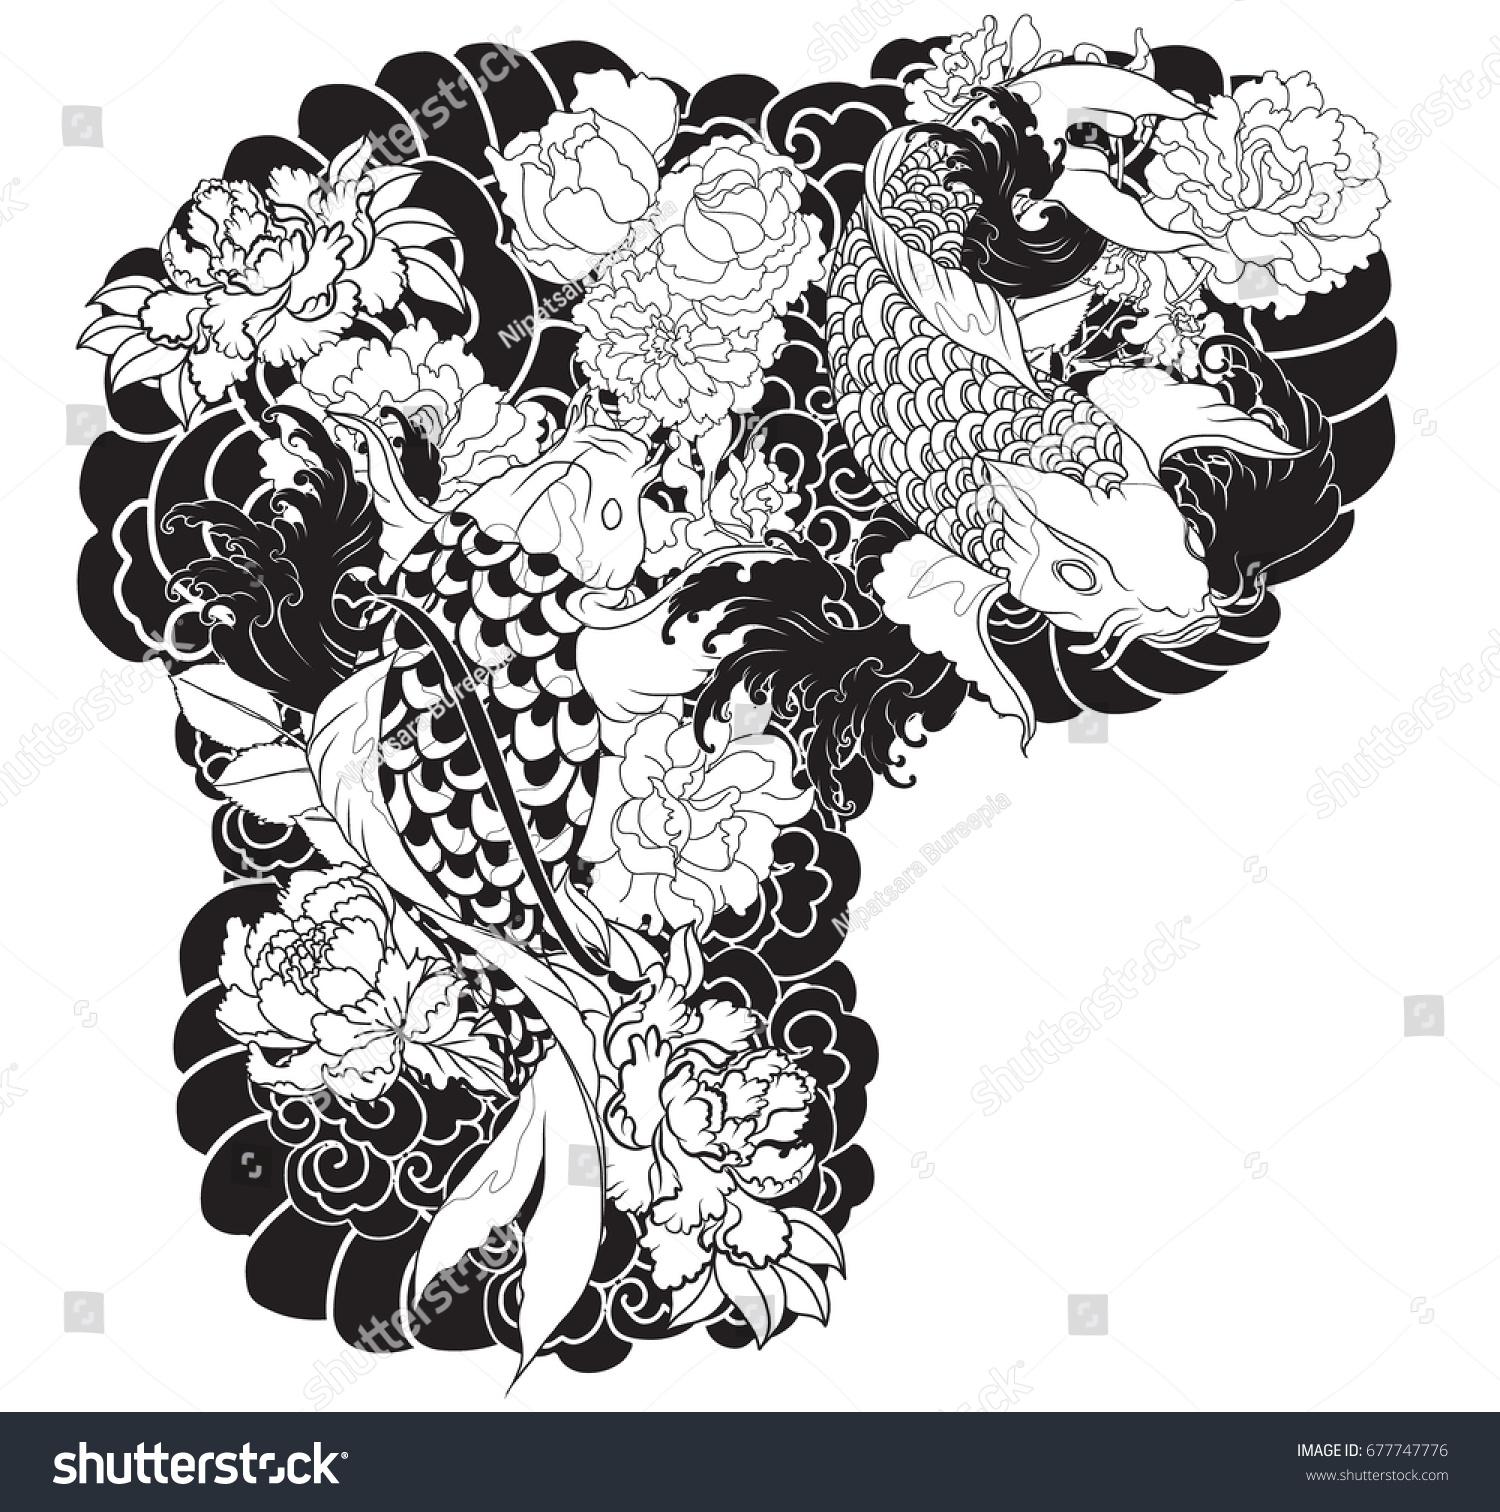 Tattoo design for upper arm to chestodle black koi carp with id 677747776 izmirmasajfo